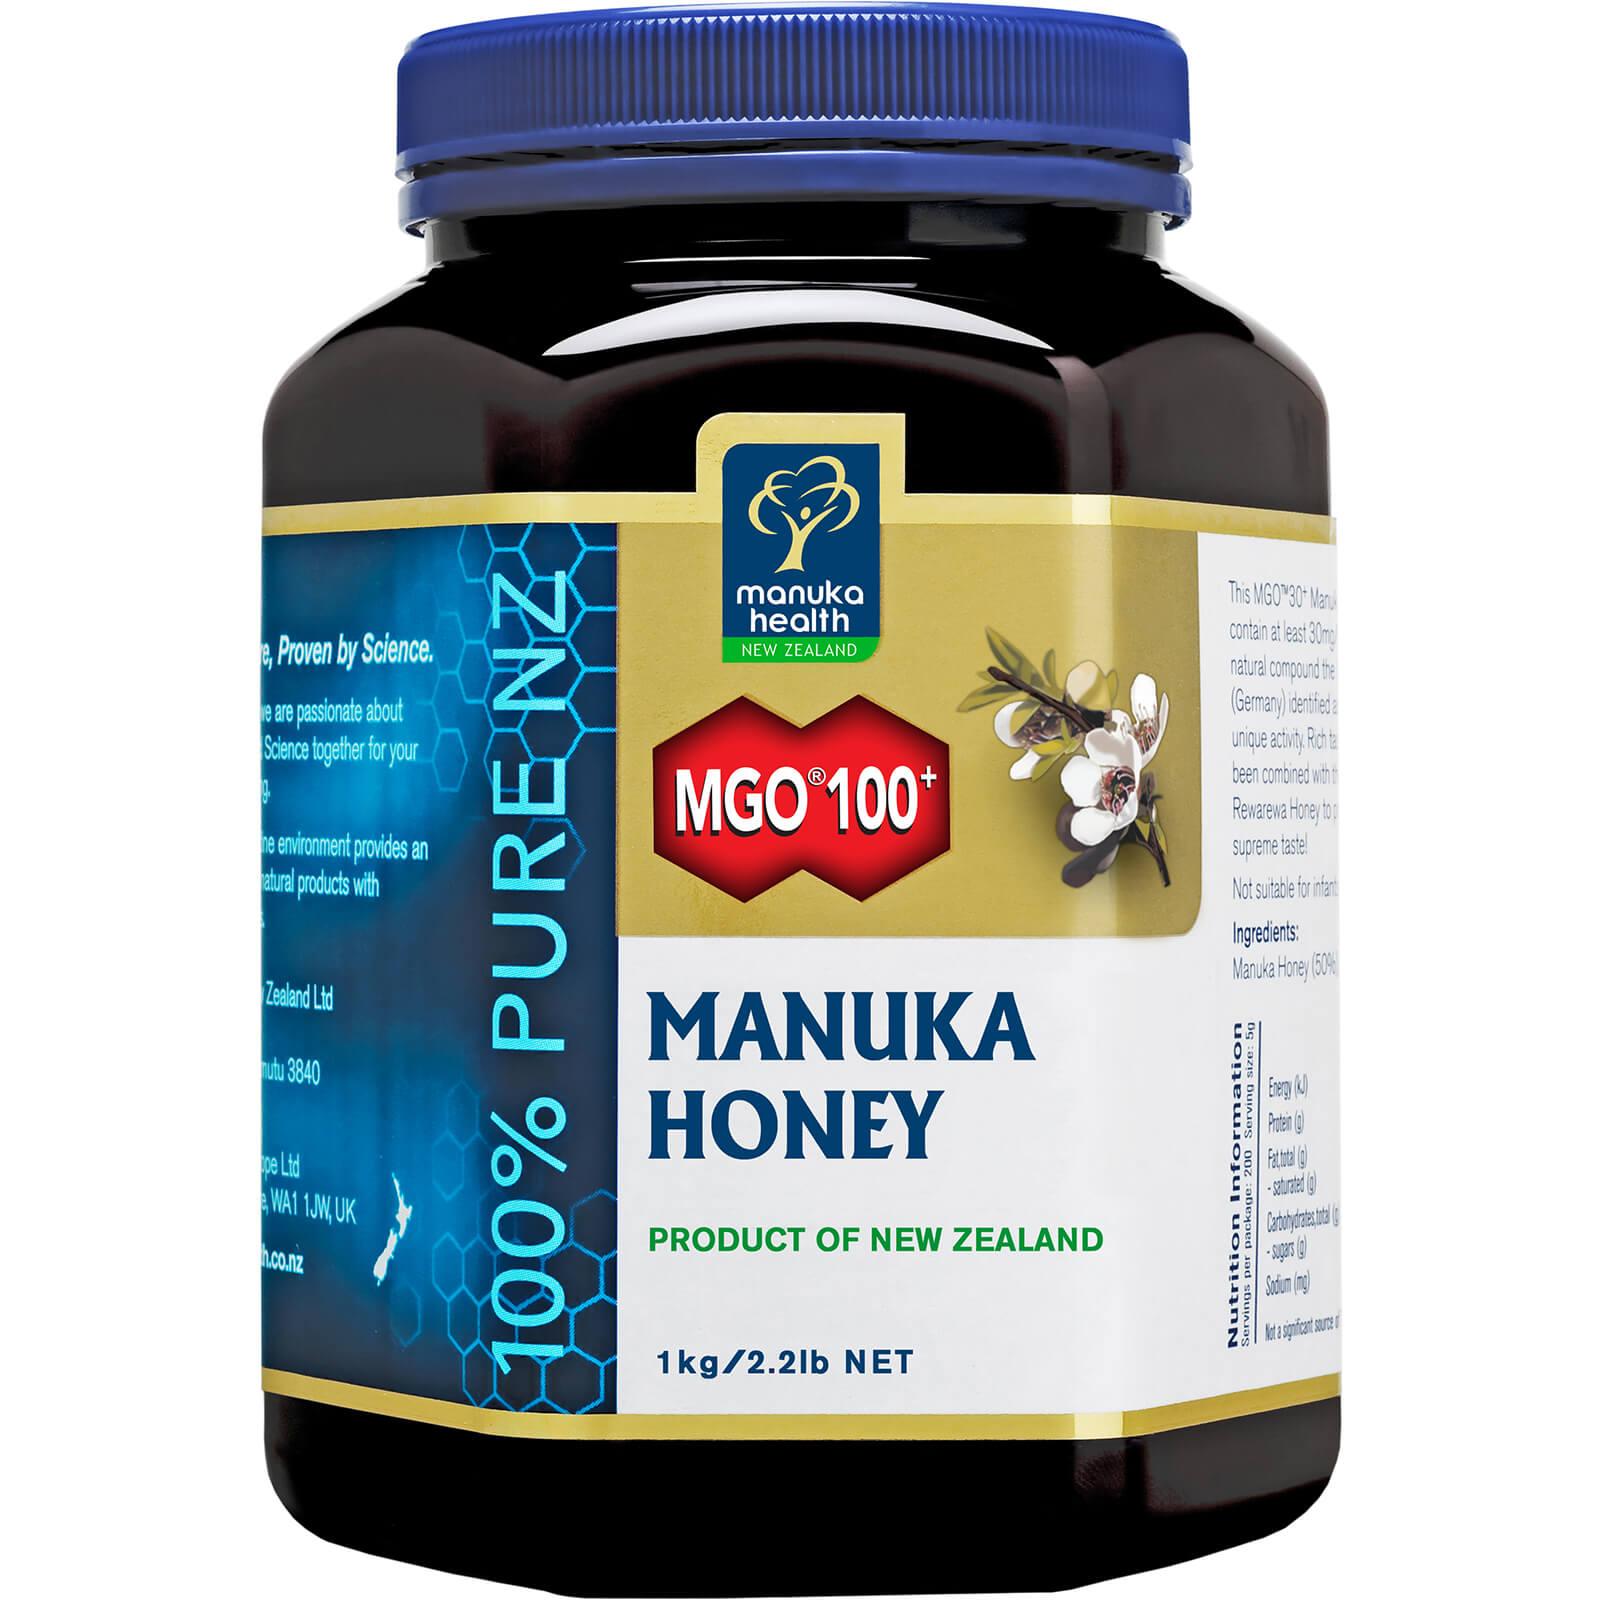 Manuka Health New Zealand Ltd MGO 100+ Pure Manuka Honey Blend - 1KG